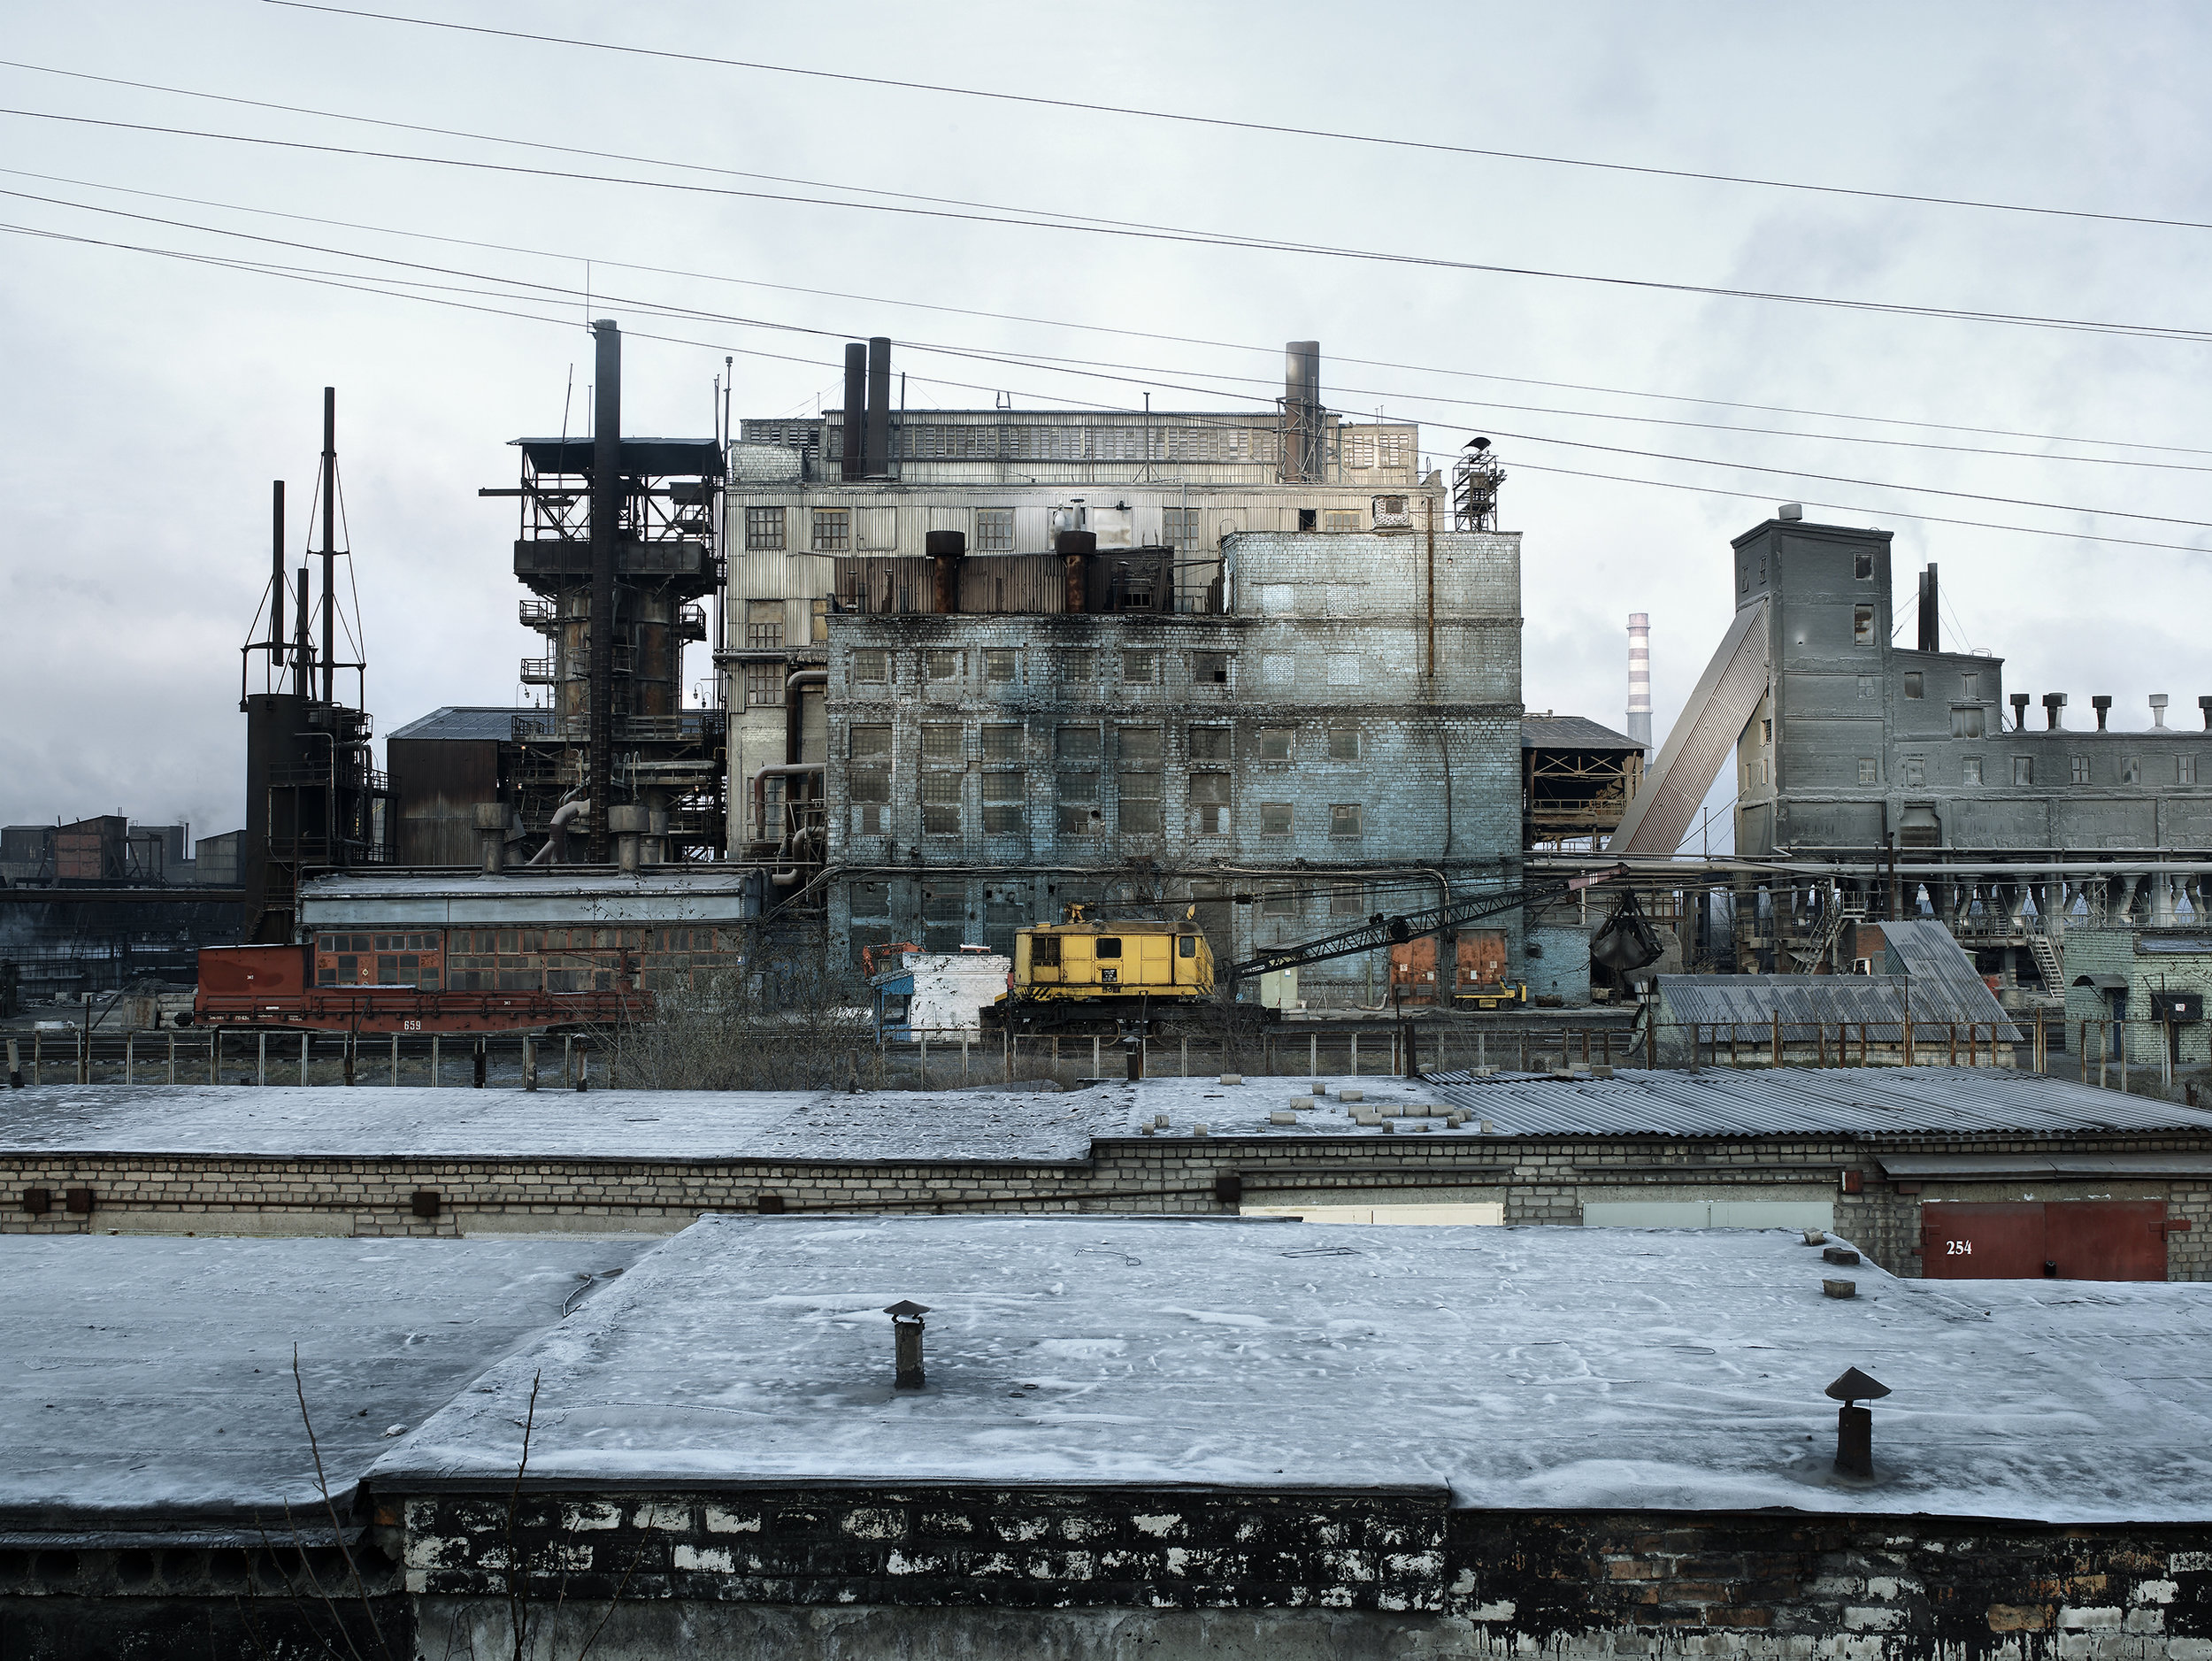 Unknown production factory, Ukraine, 2007.